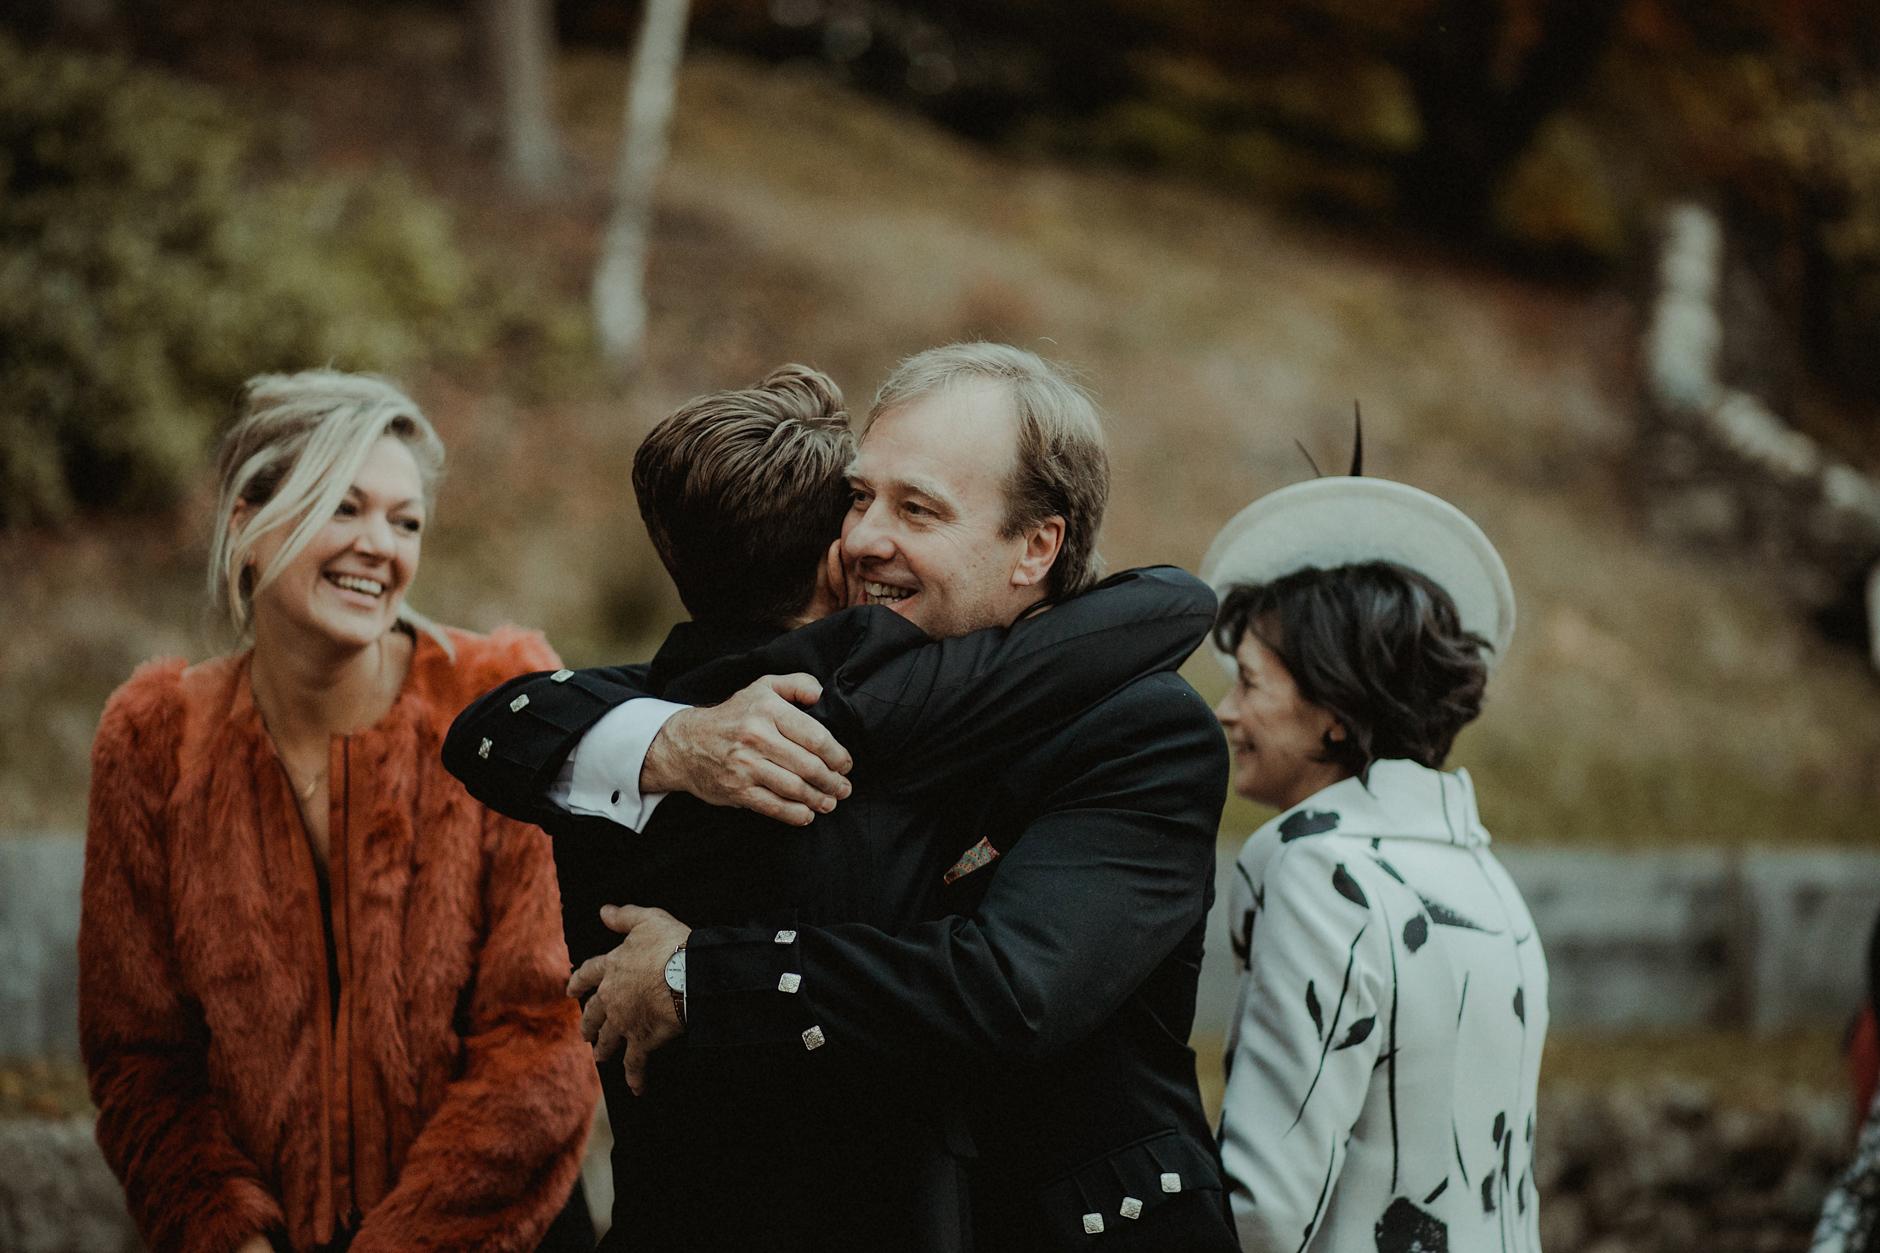 Glentruim-Wedding-Nikki-Leadbetter-Photography-130.jpg